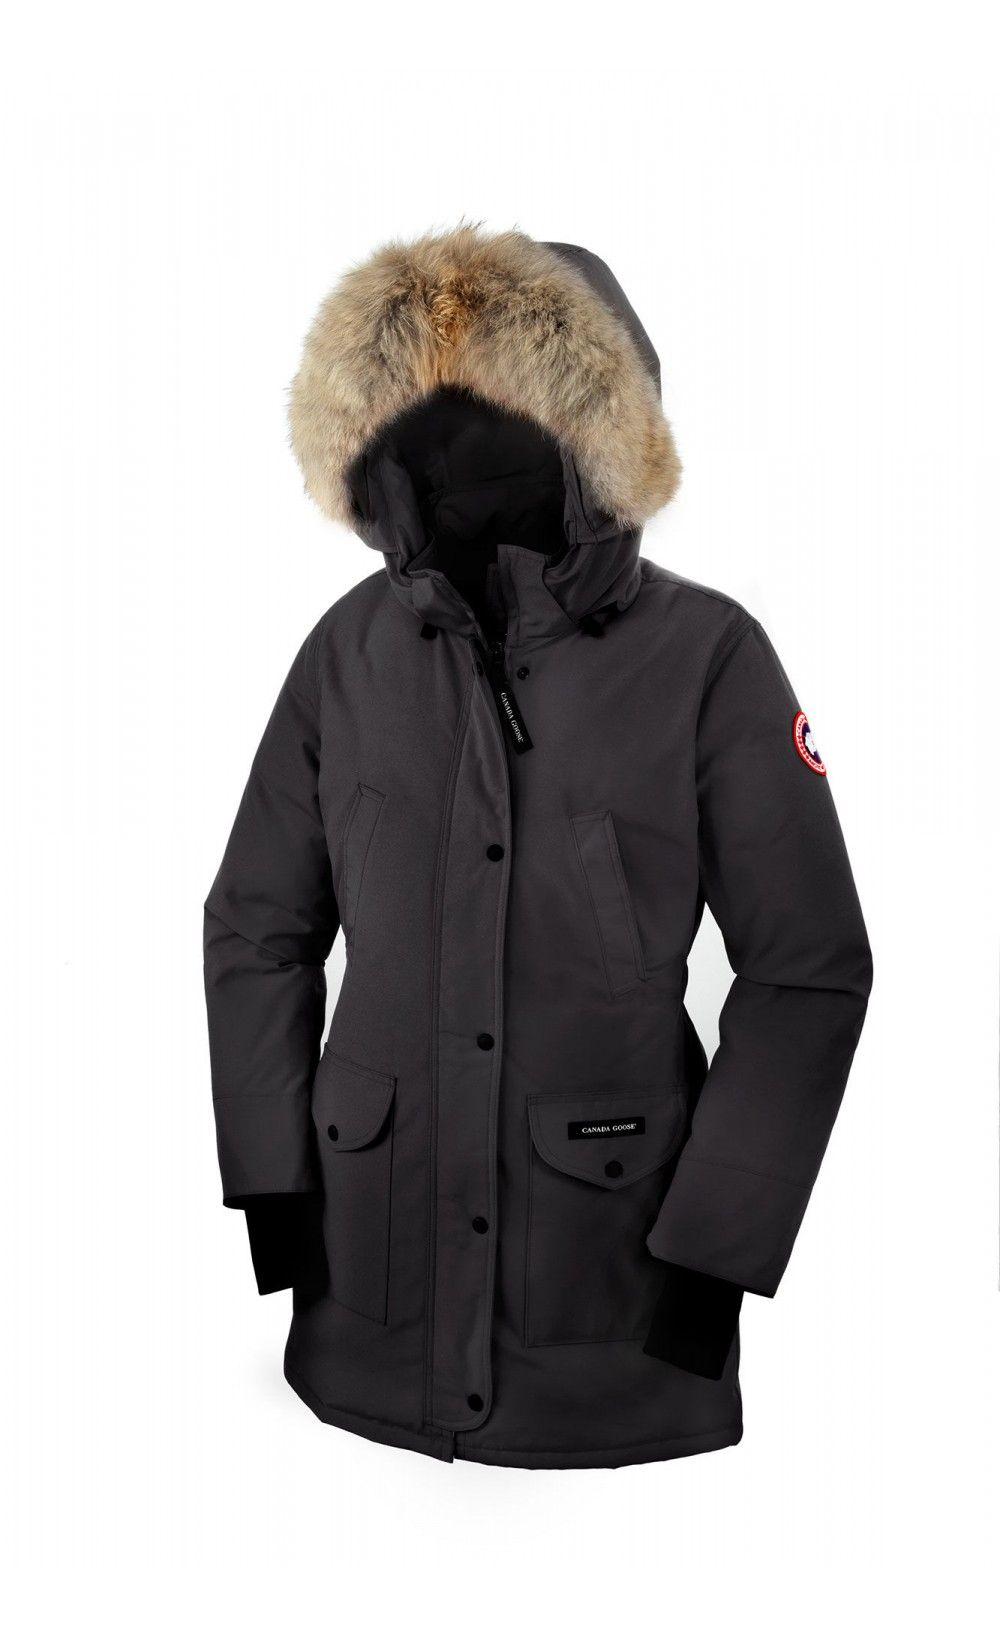 b960079b200 Canada Goose Trillium Parka Black Women - Canada Goose #canadagoose #parka # jacket #fashion #style #shopping #women #lifestyle